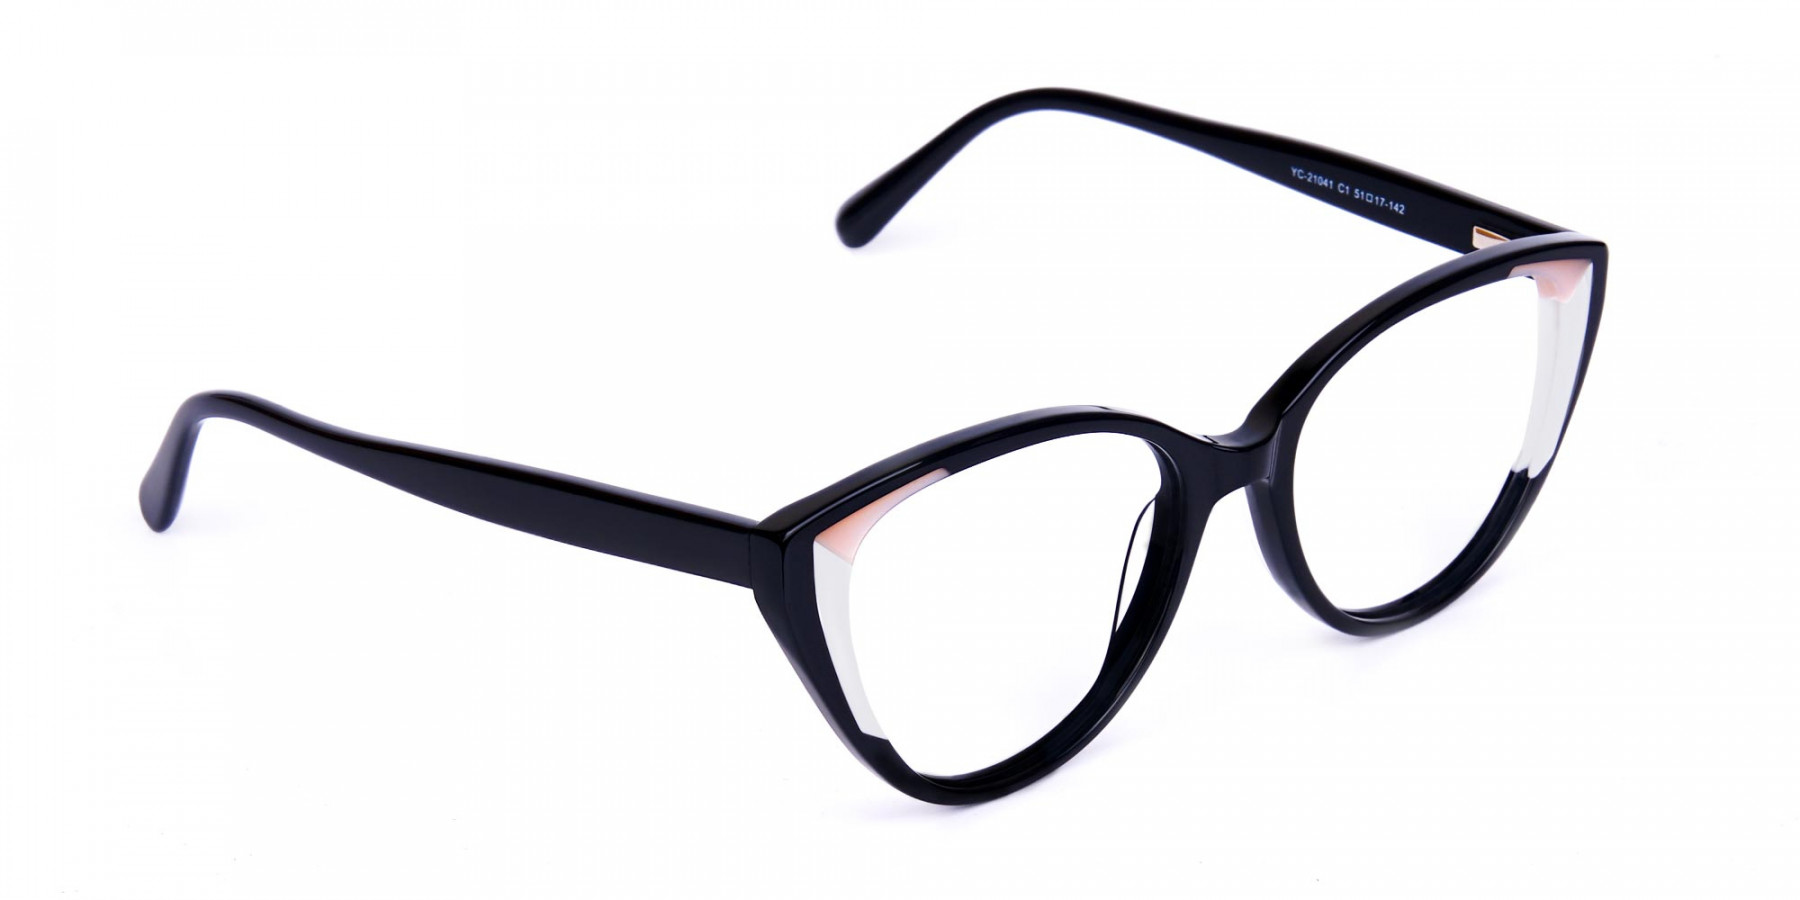 Black-and-Translucent-Cat-Eye-Glasses-Frame-1